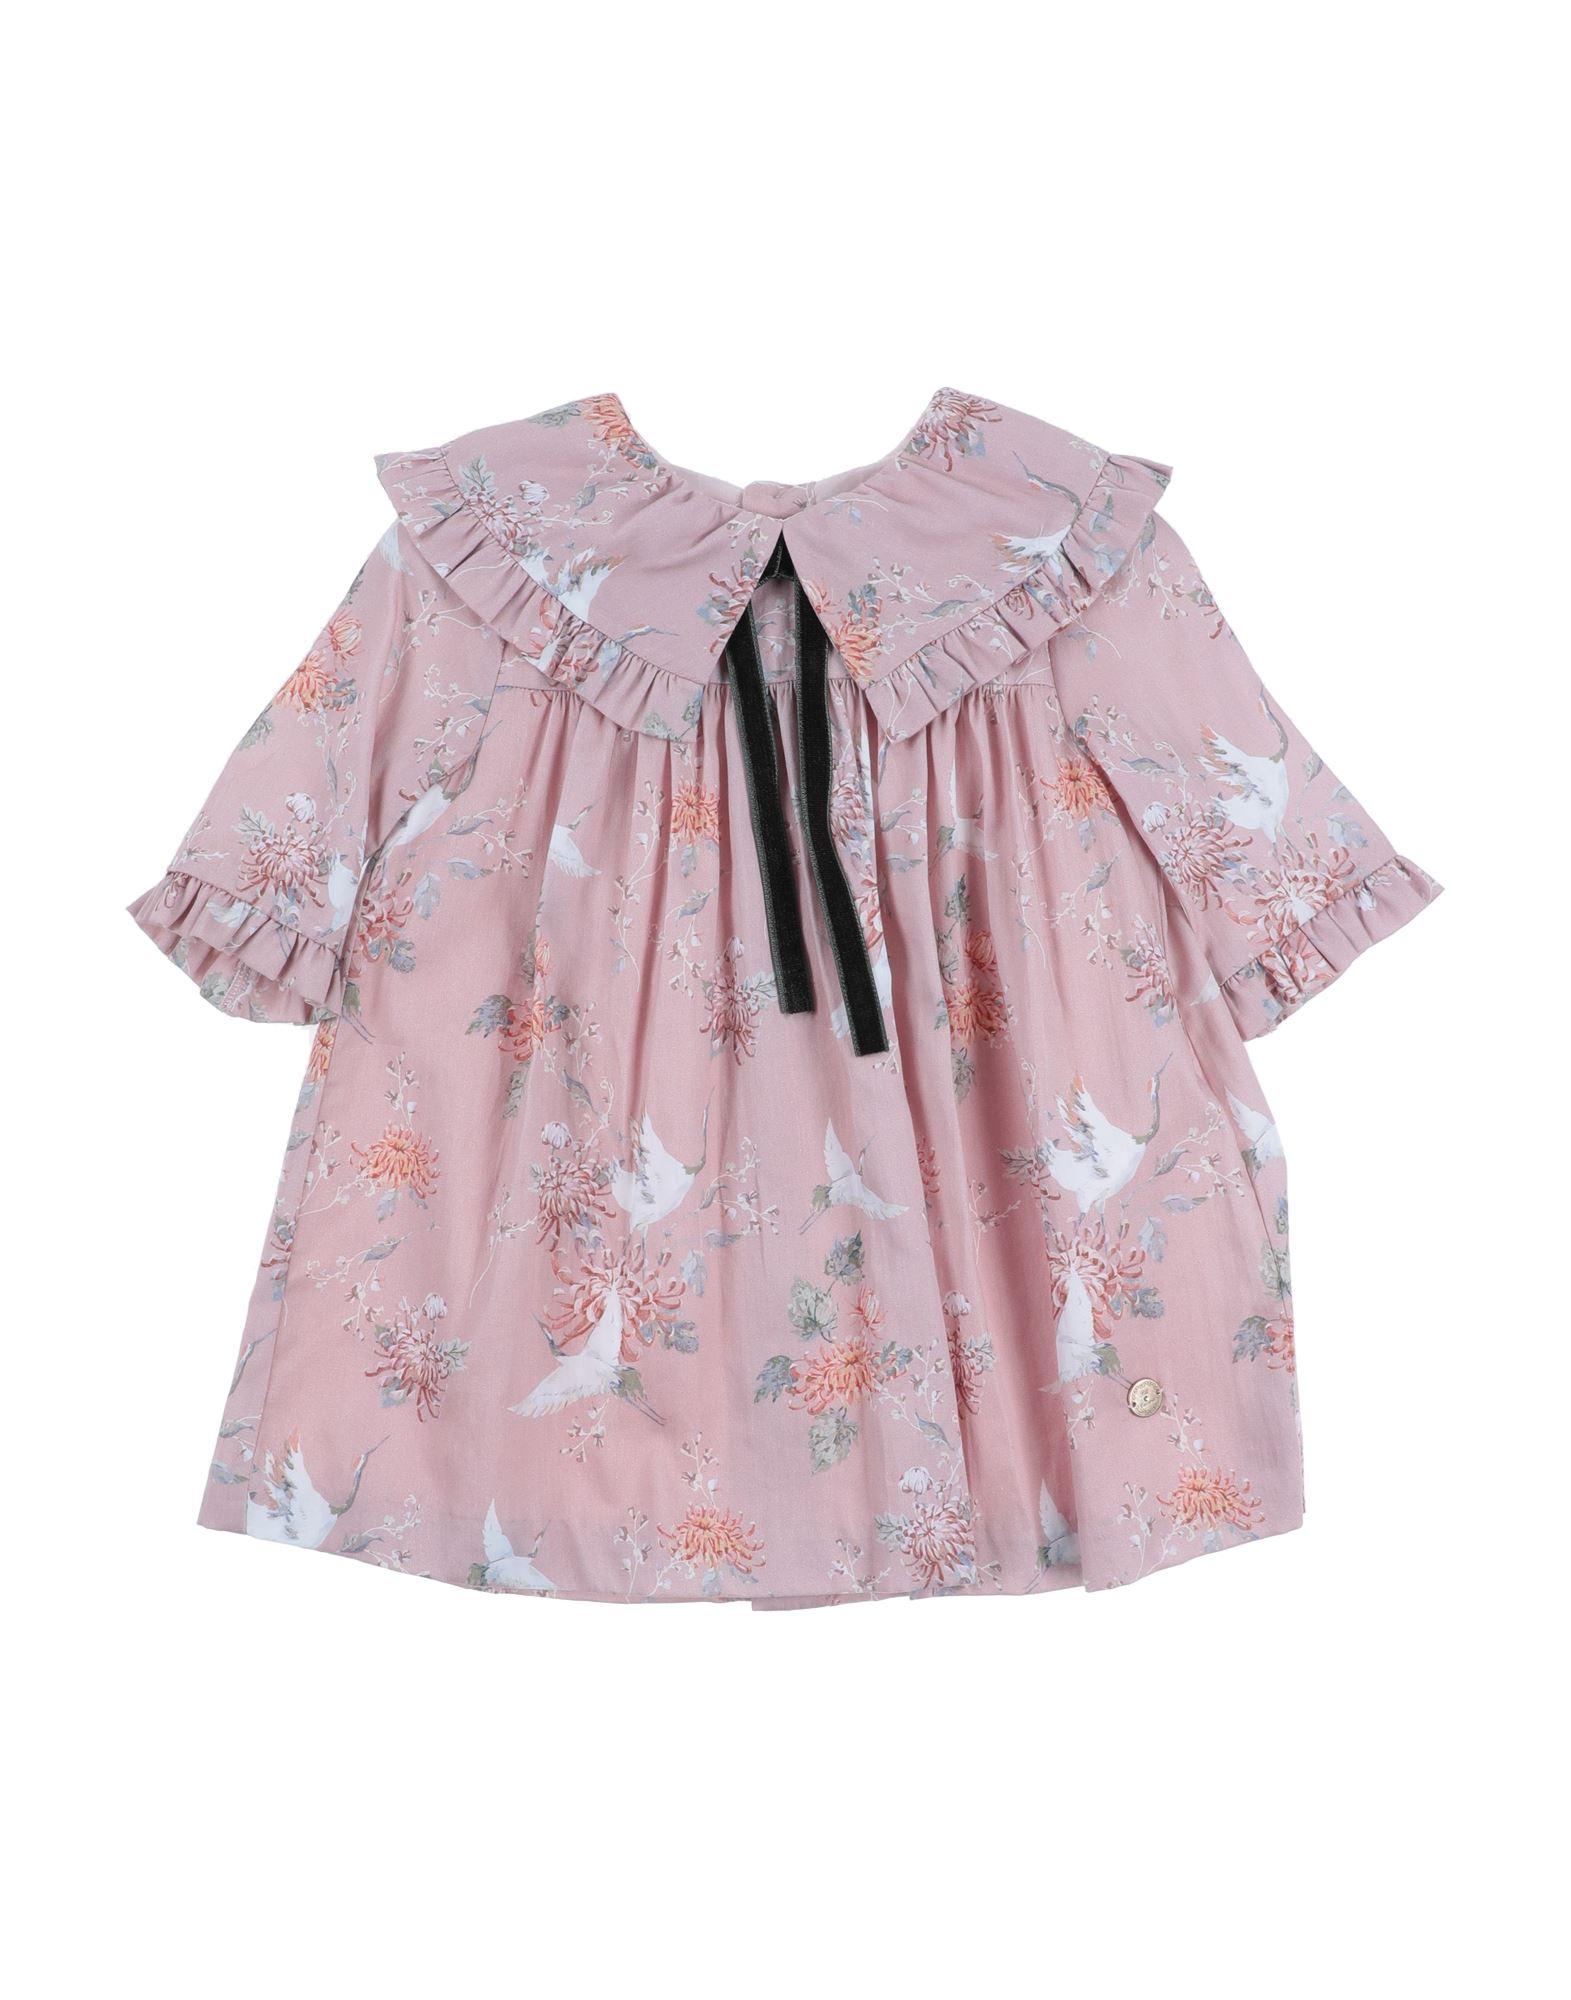 PILI CARRERA Dresses - Item 15125995